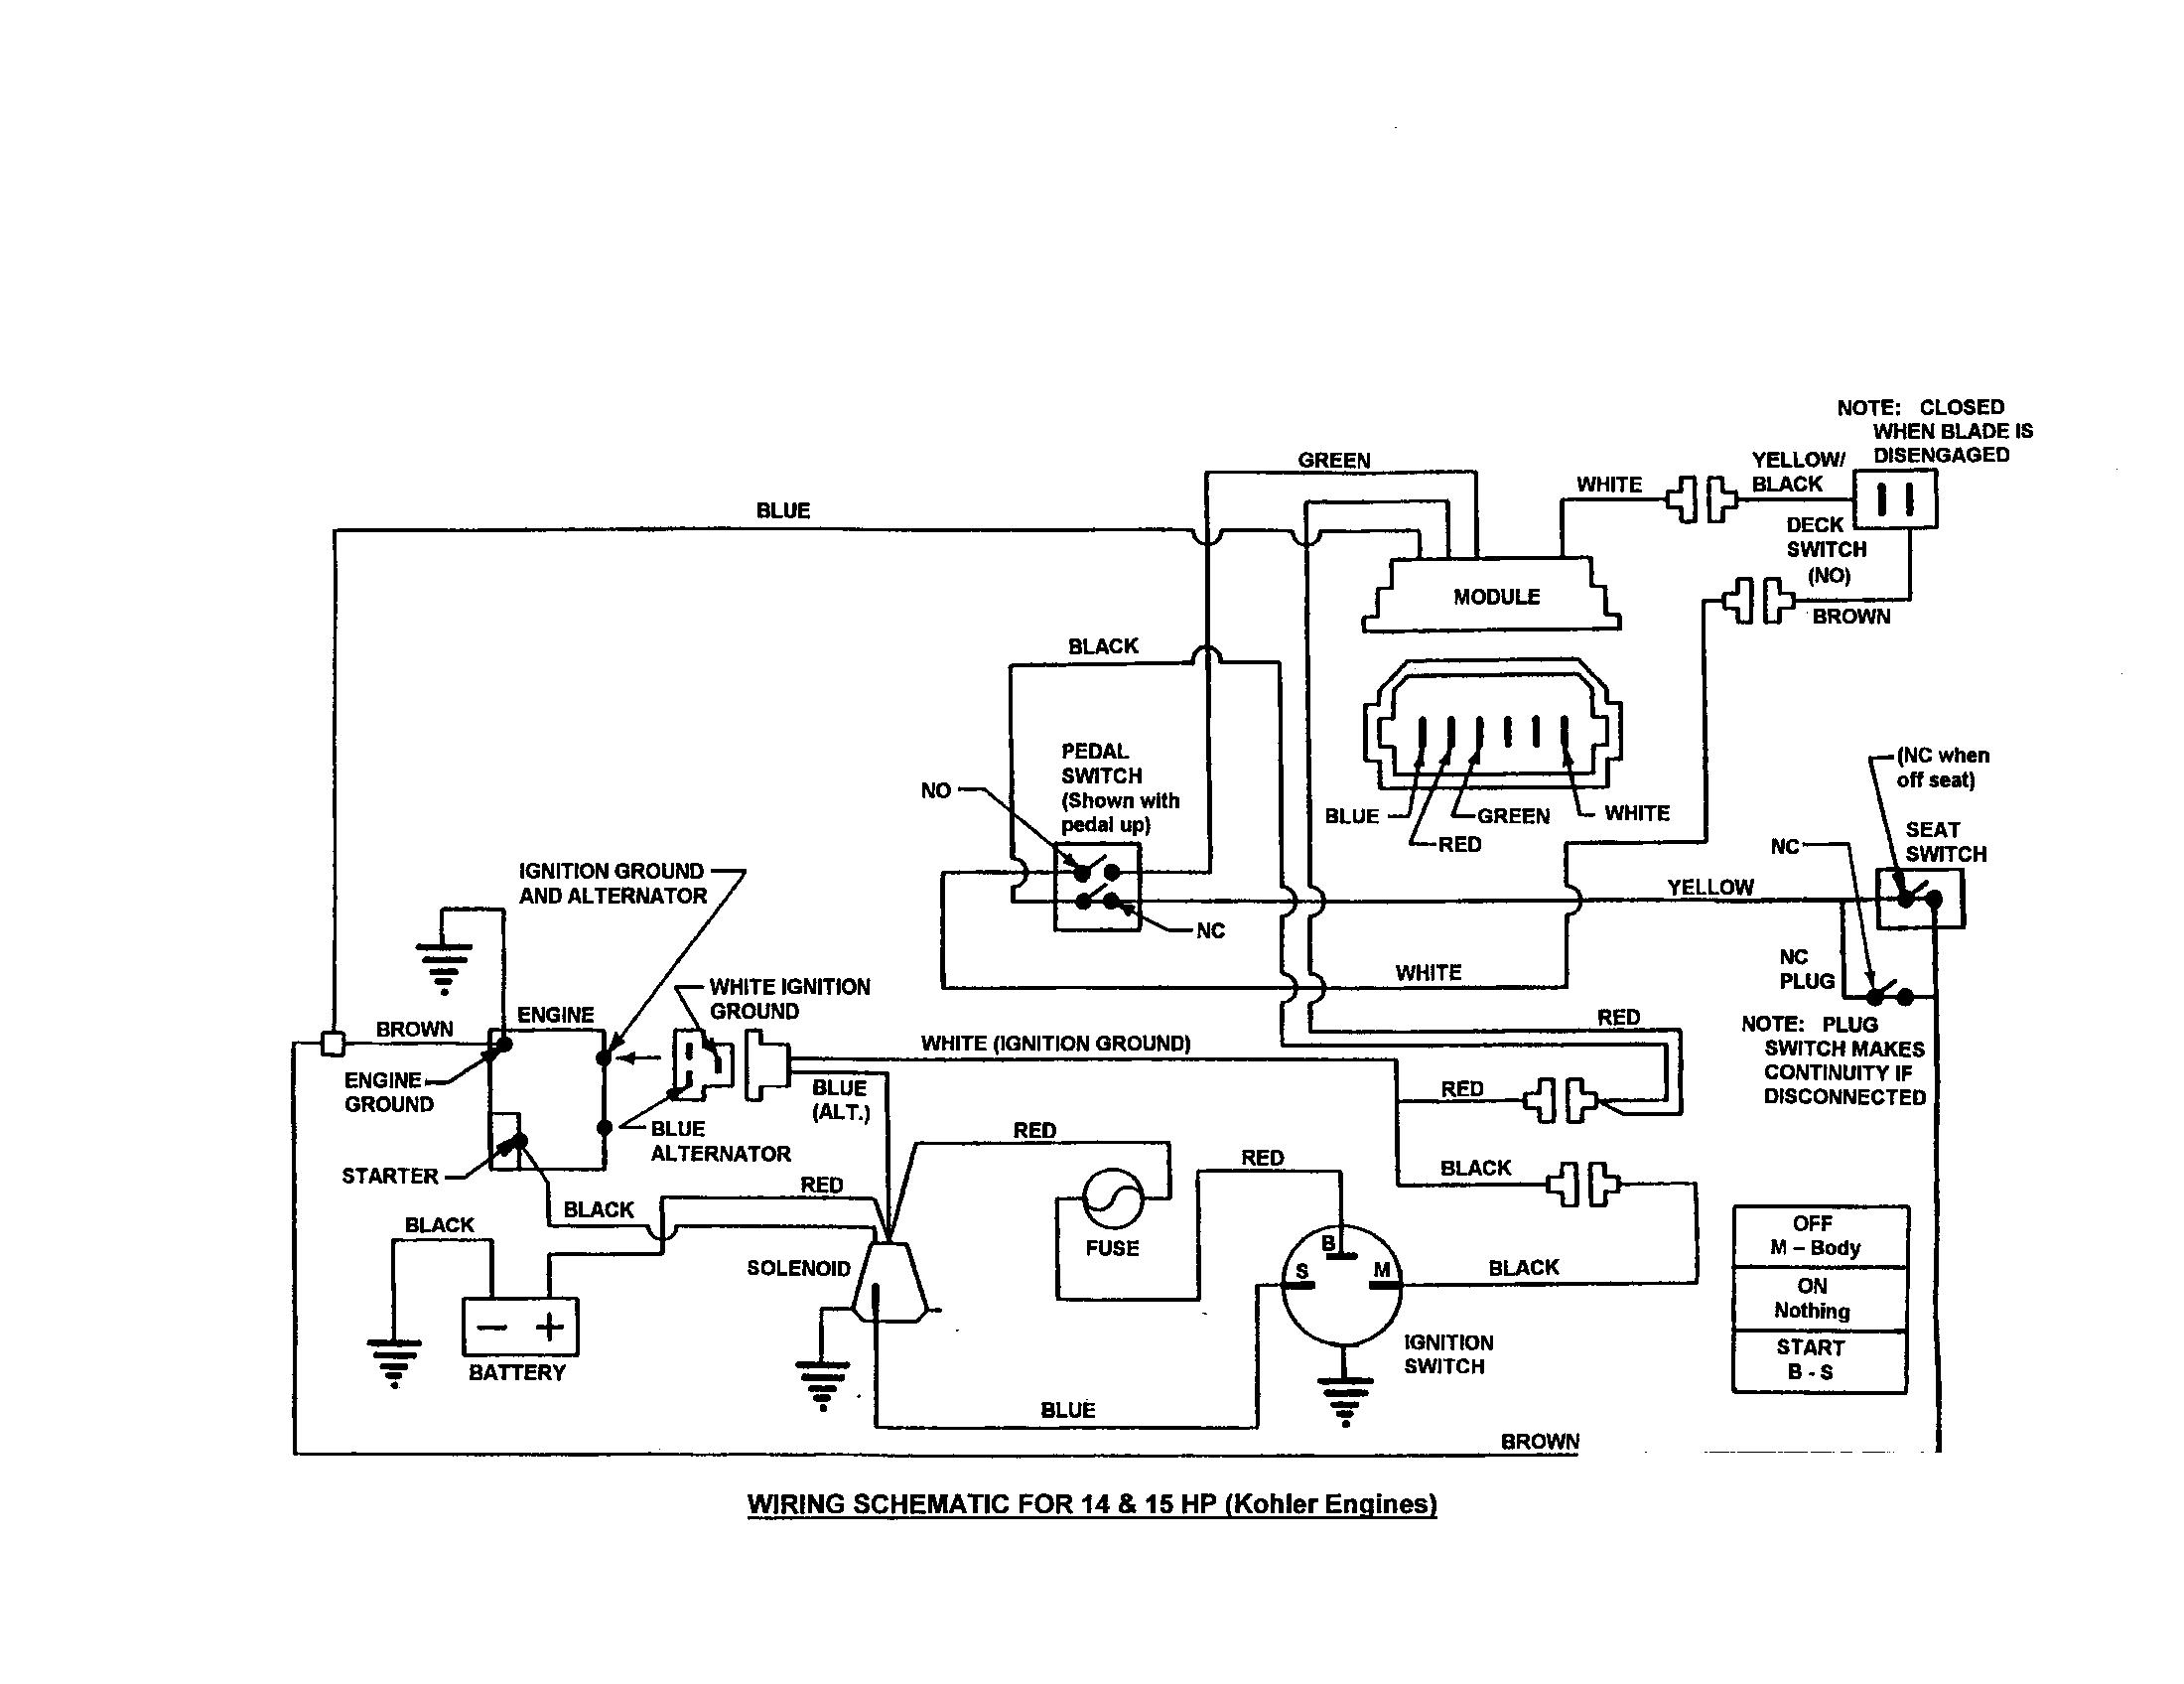 medium resolution of snapper 250816b wiring schematic 14 15 hp kohler diagram